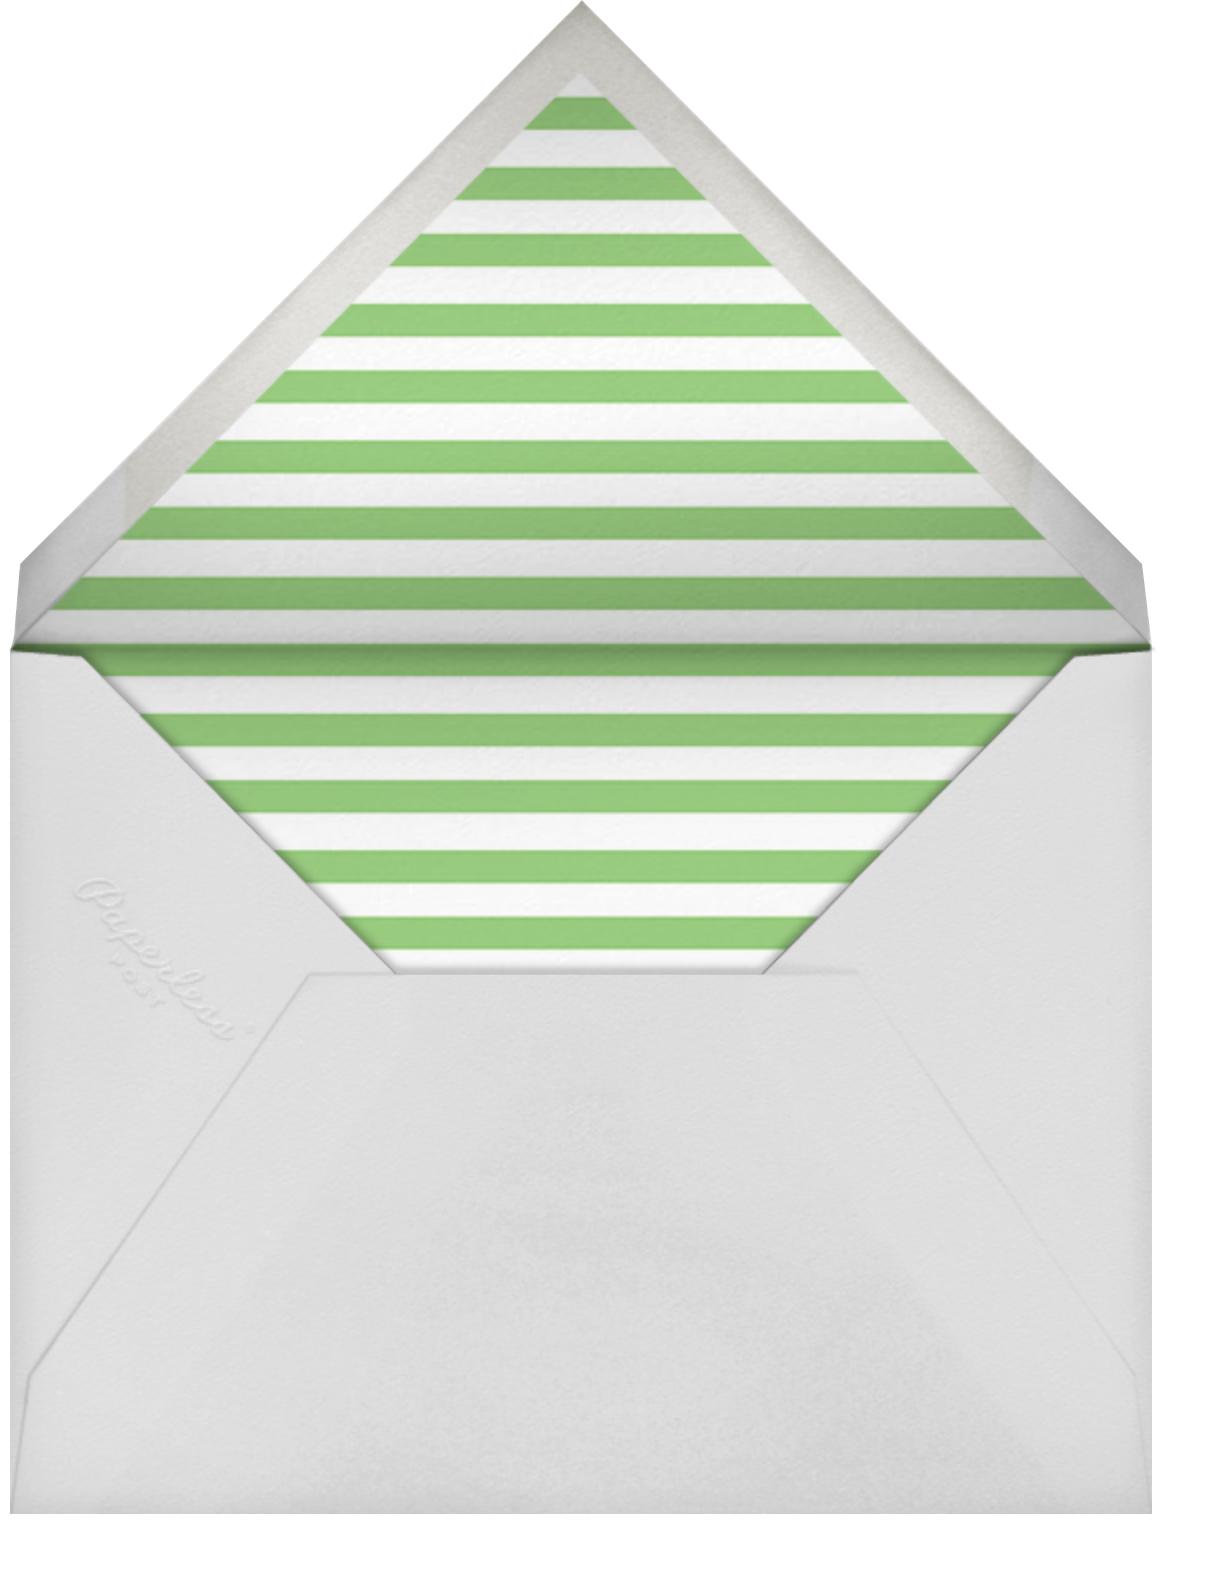 Horizontal Split - Cyan - Paperless Post - Professional events - envelope back